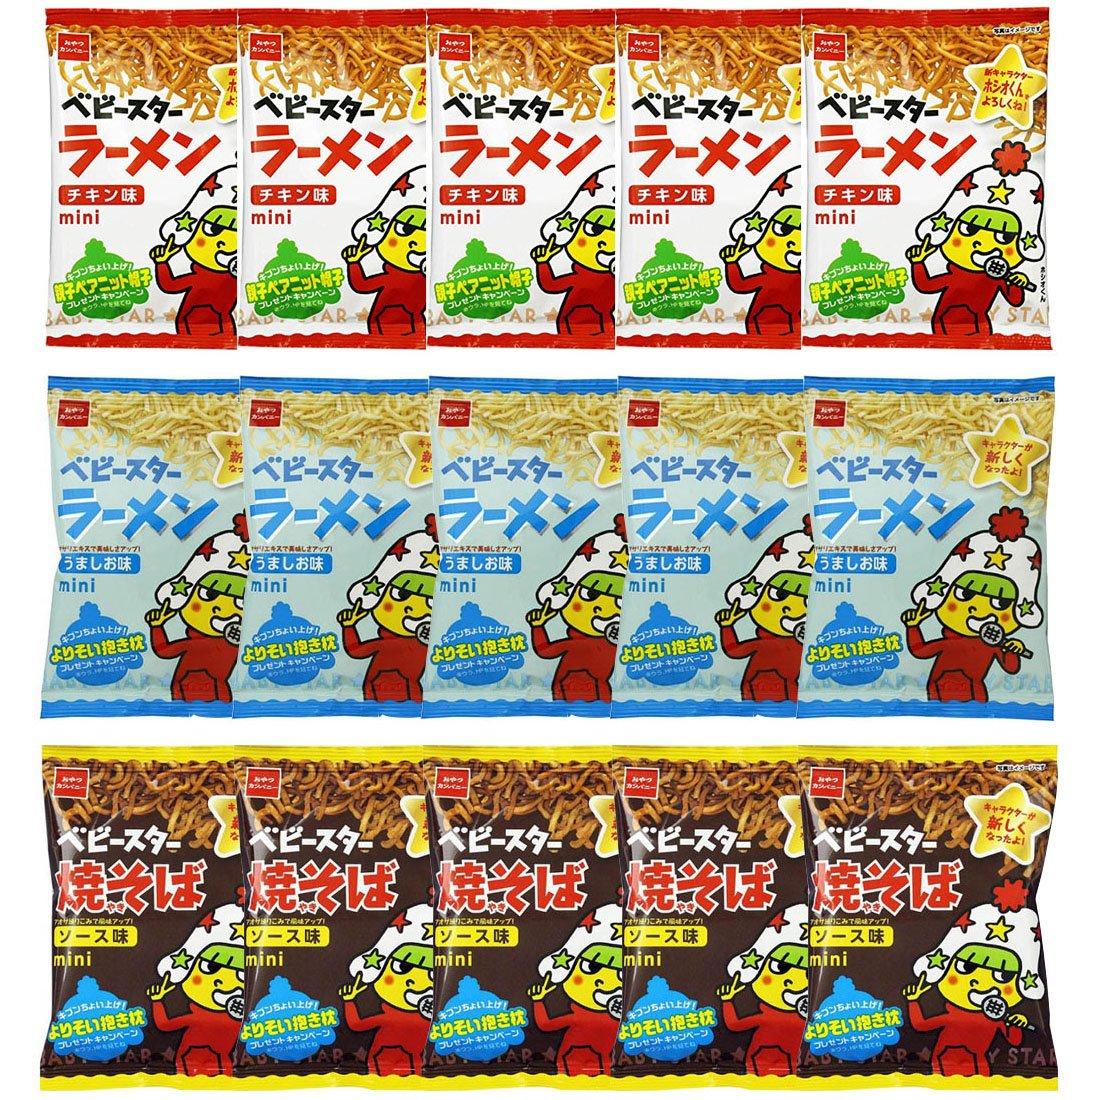 Baby Star Ramen unisex mini unisex Assorted B 15 Popula Packs Various Japanese